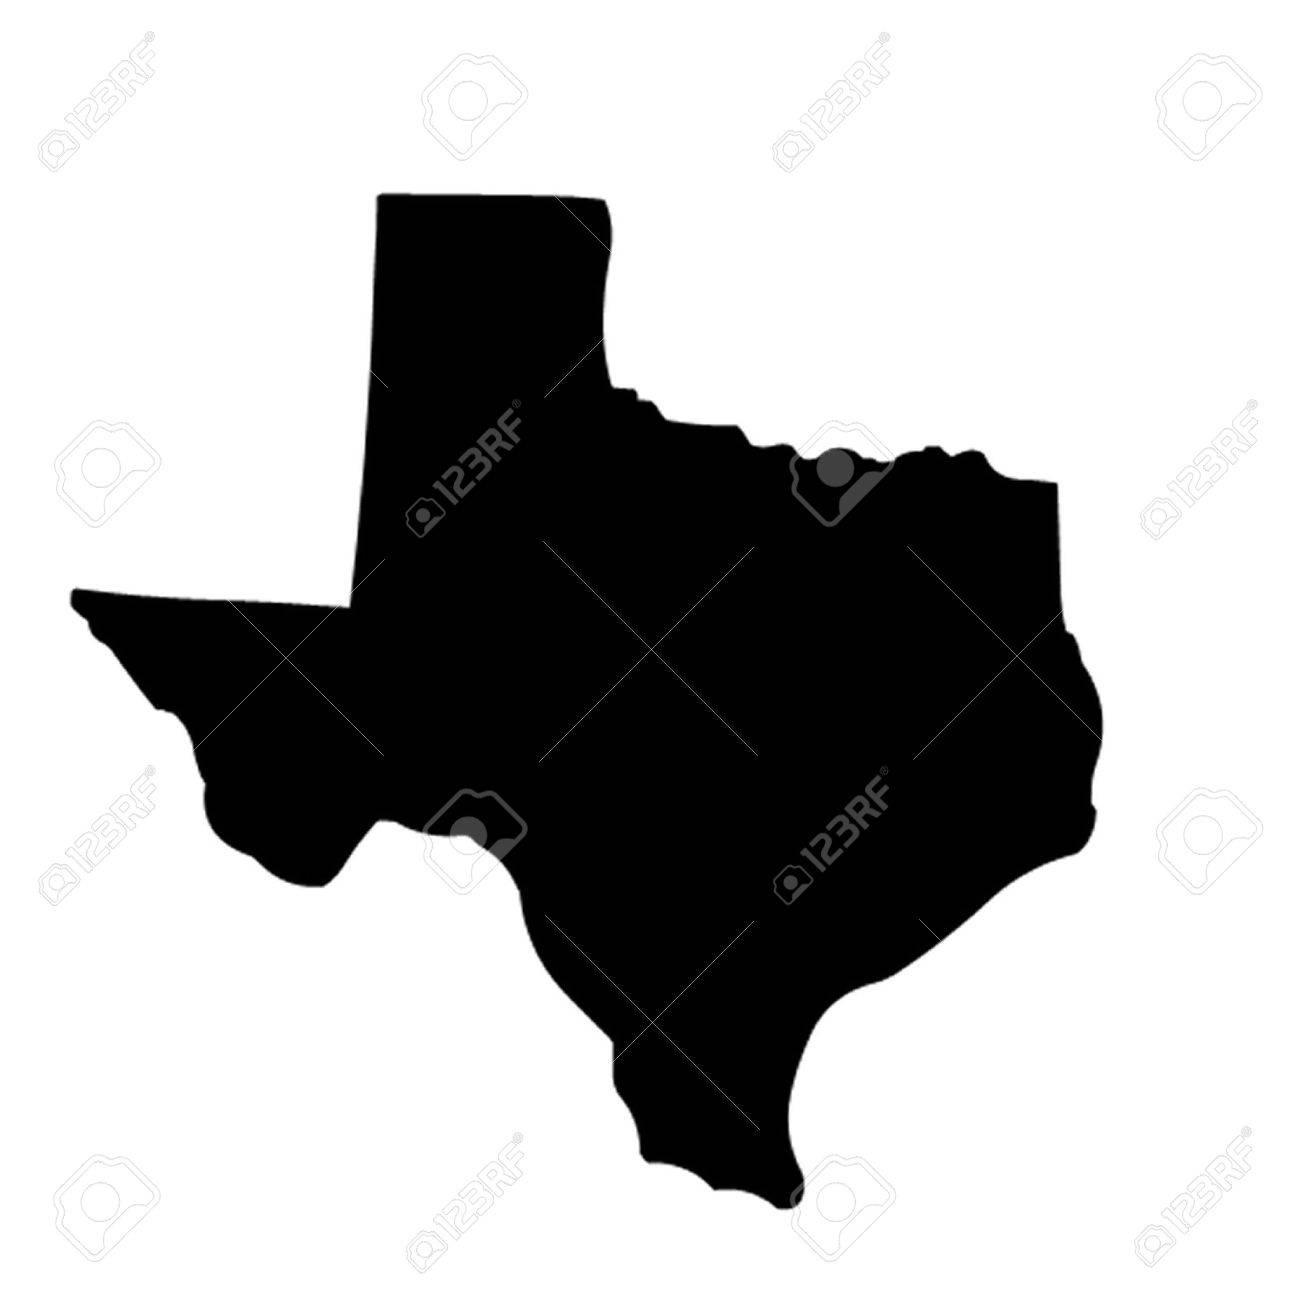 Texas State USA Stock Vector - 12066199